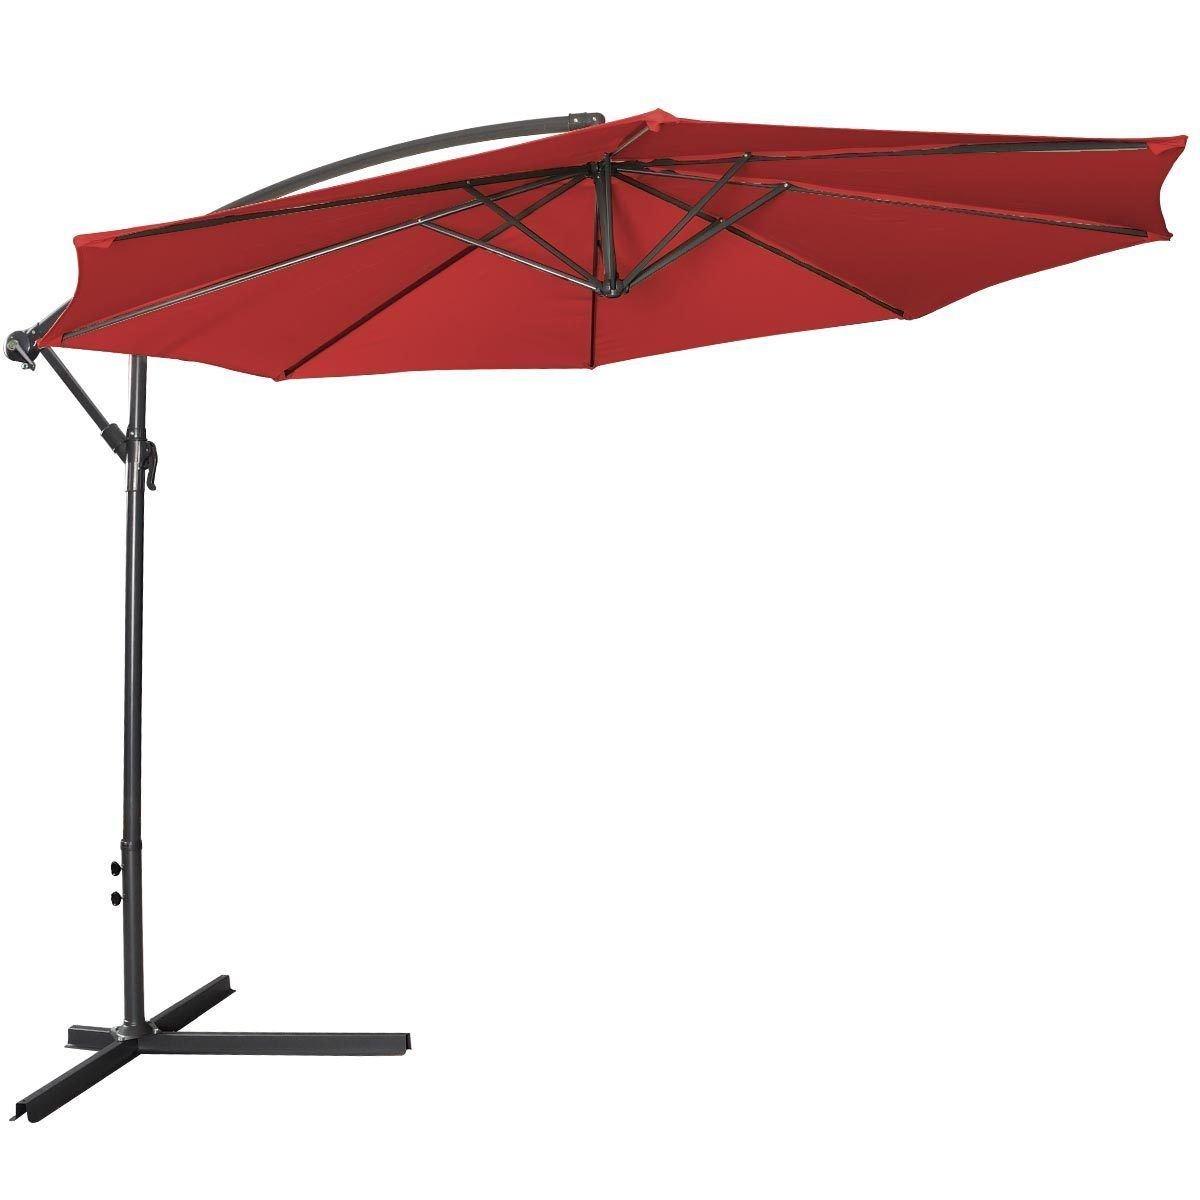 10 Hanging Umbrella Patio Sun Shade Offset Outdoor Market W Corss Base Burgundy